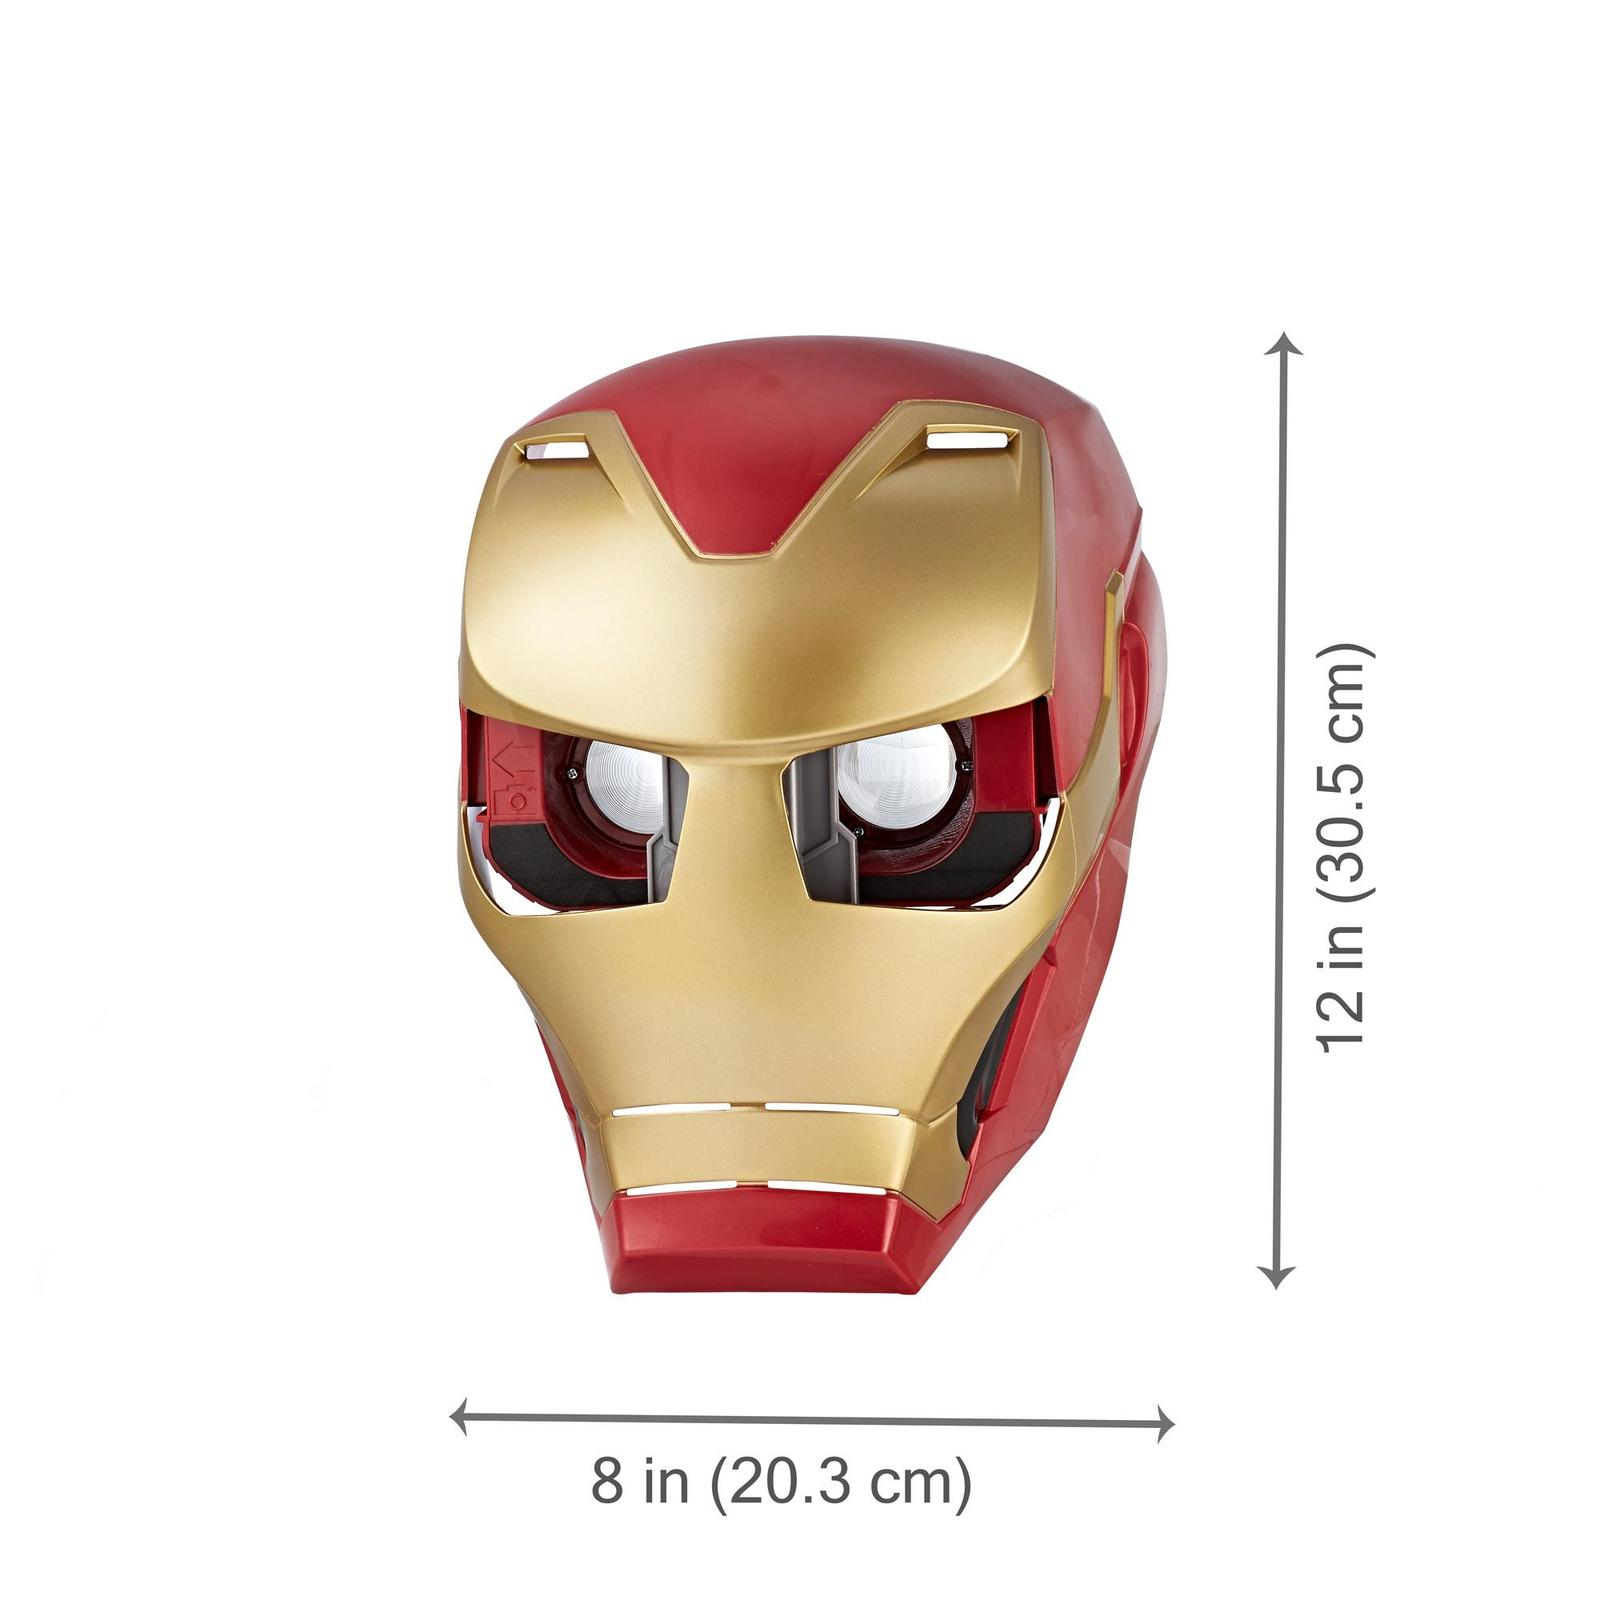 Avengers Infinity War: Hero Vision - Iron Man AR Mask image